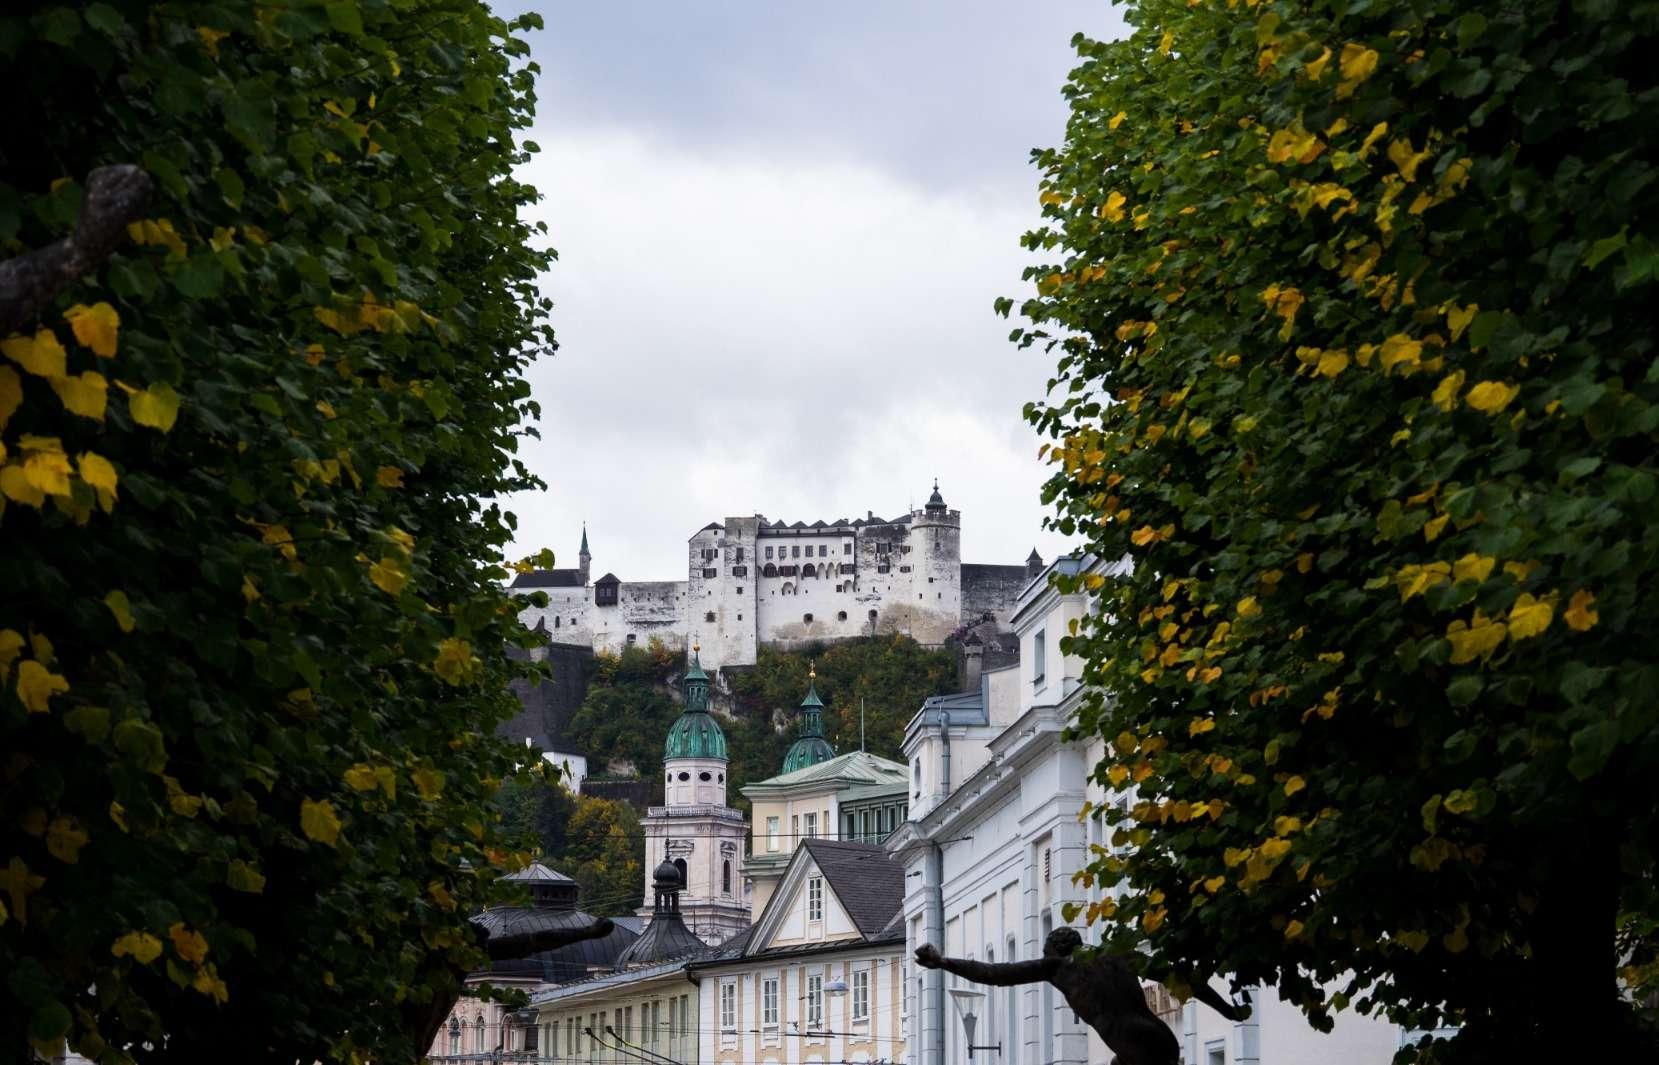 Salzburg castle framed by trees